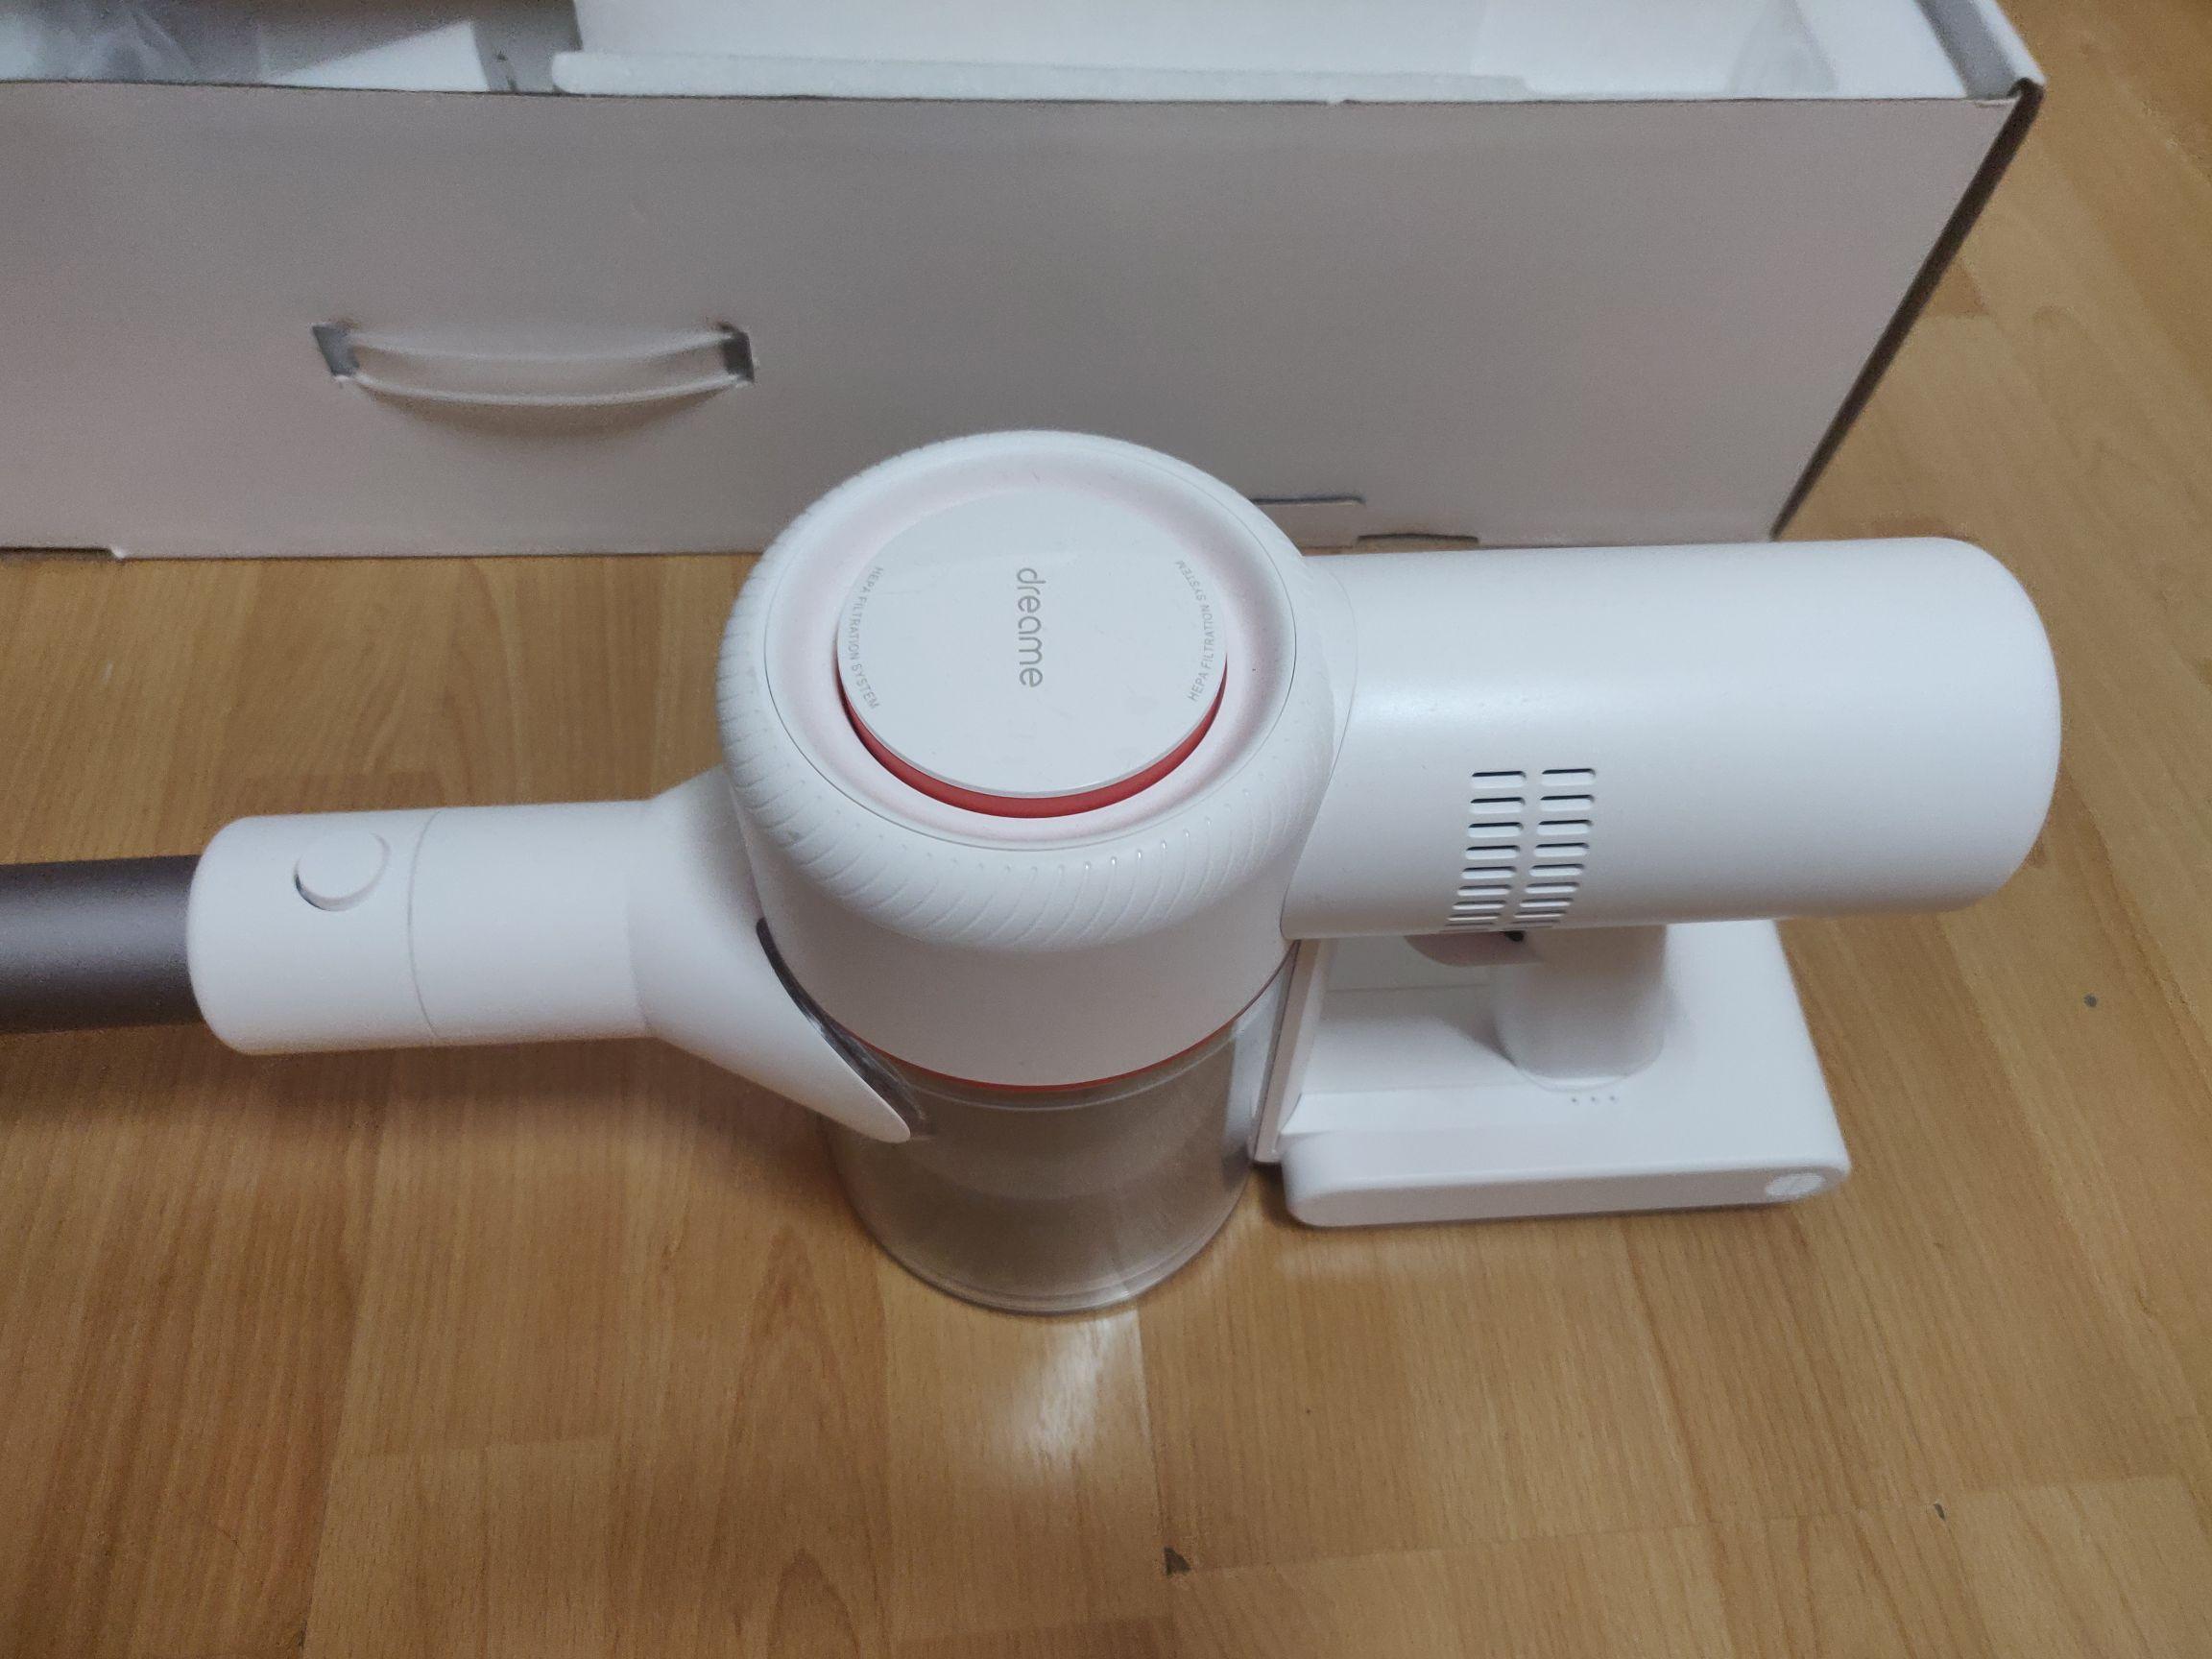 Xiaomi Dreame V9. De los mejores aspiradores escoba sin cable. Desde España